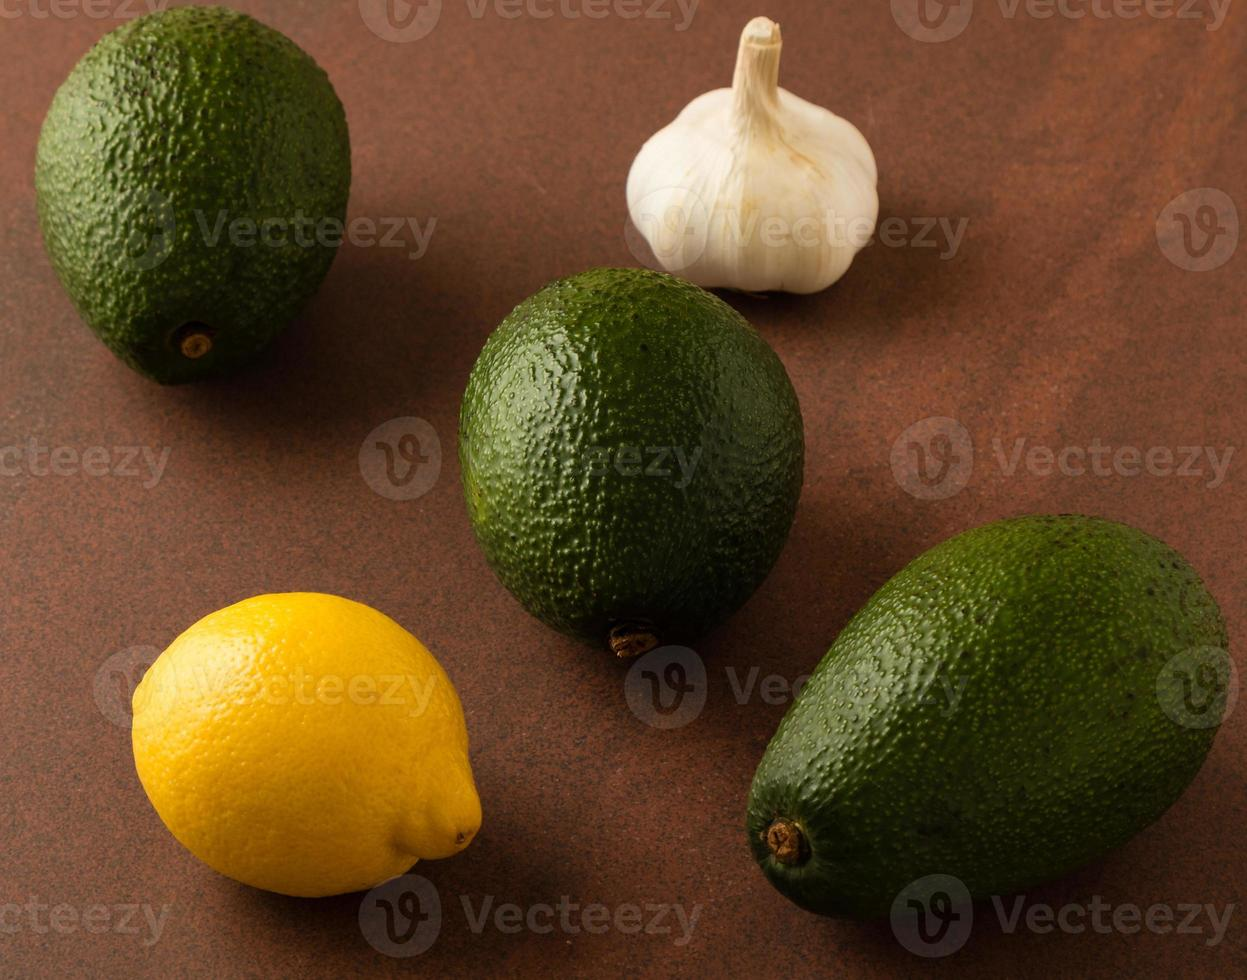 Avocado on tabel photo